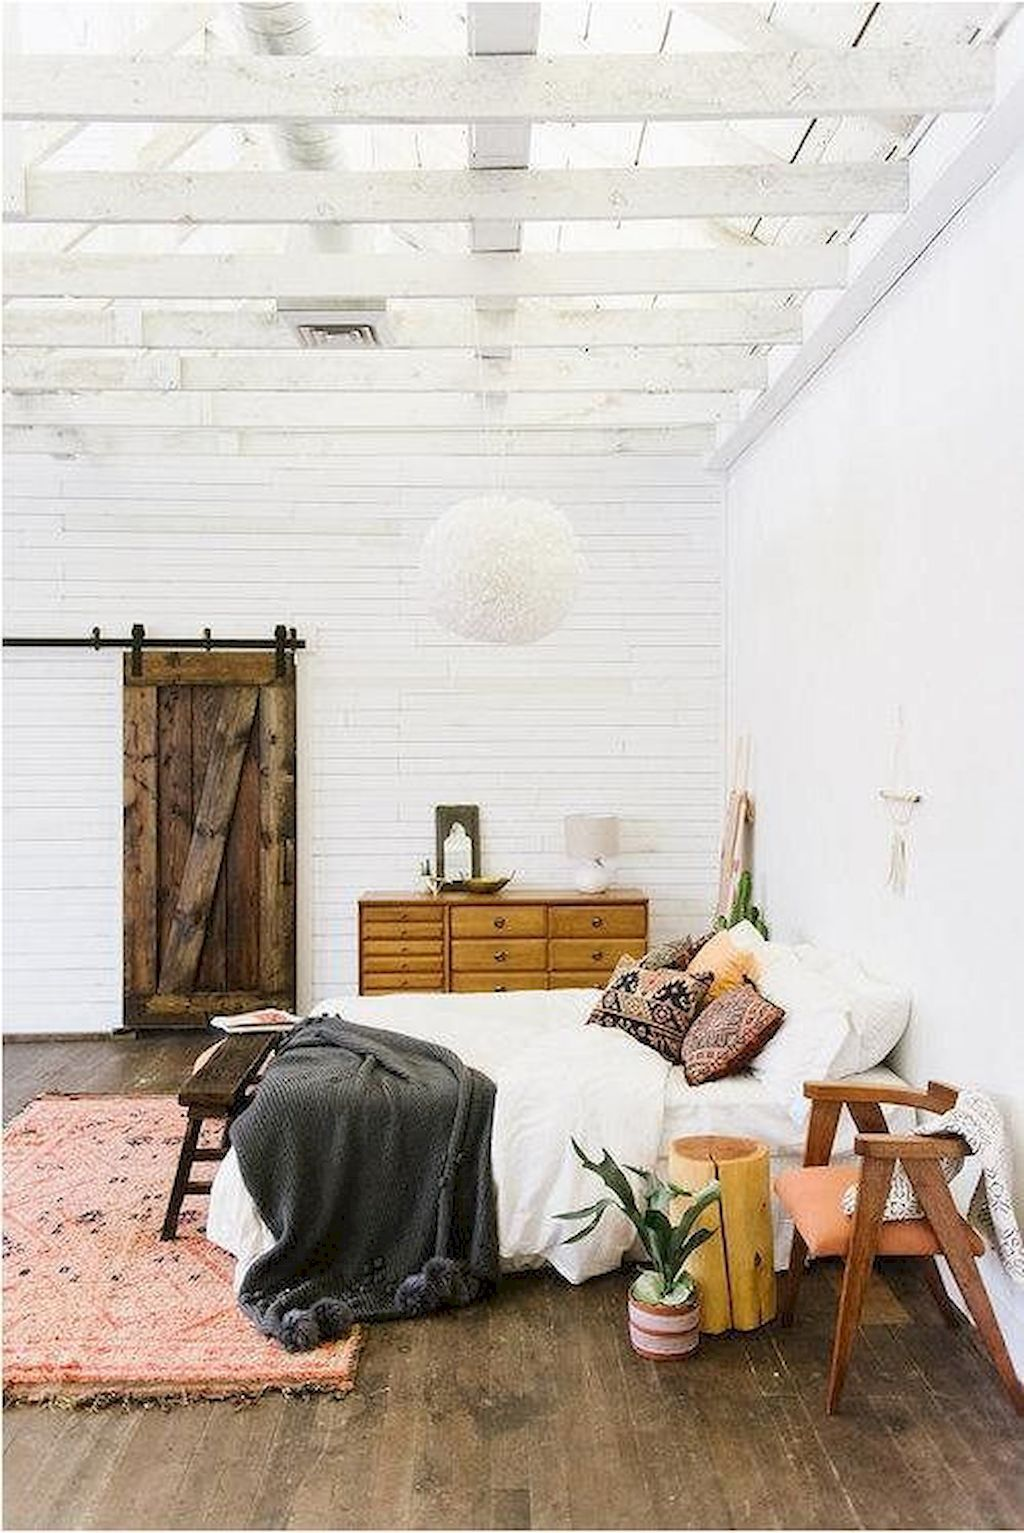 27 Cozy Apartment Bedroom Makeover Decor Ideas | Pinterest